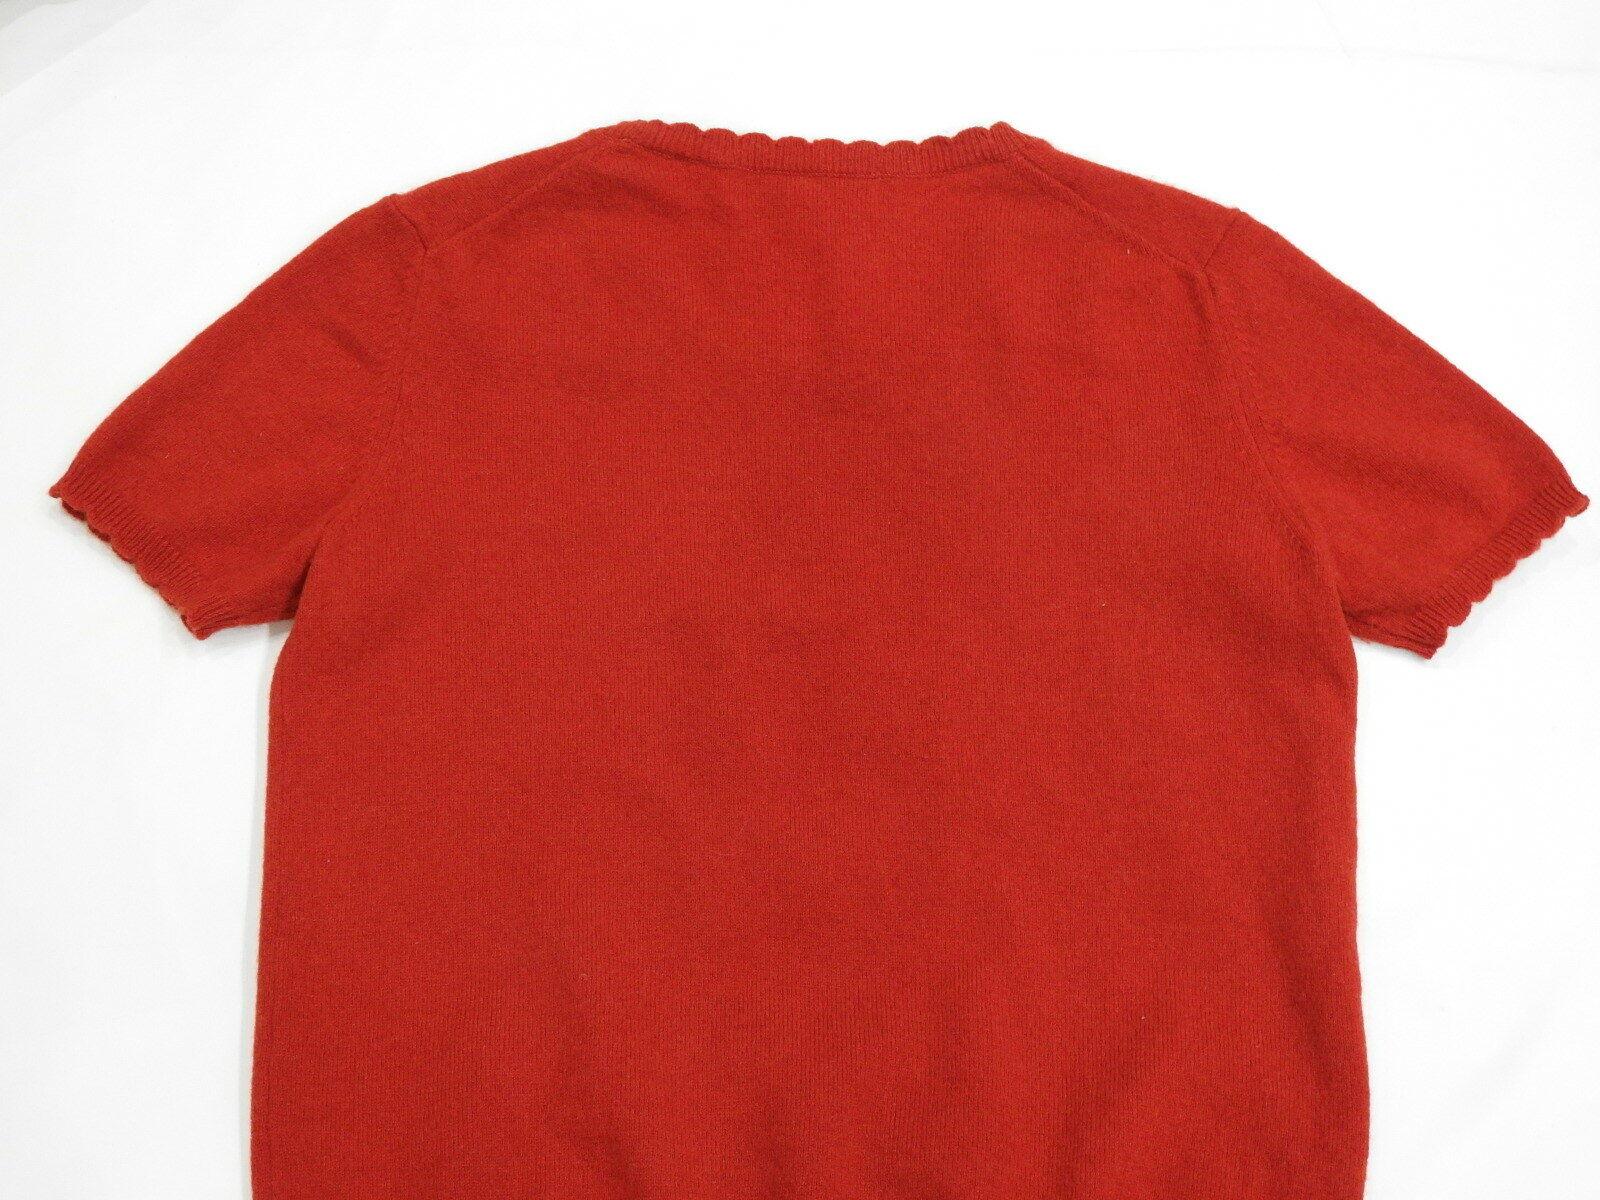 Ines De La Fressange For Uniqlo 100% Cashmere Sweater Sweater Sweater Top Red Small S 35b6db